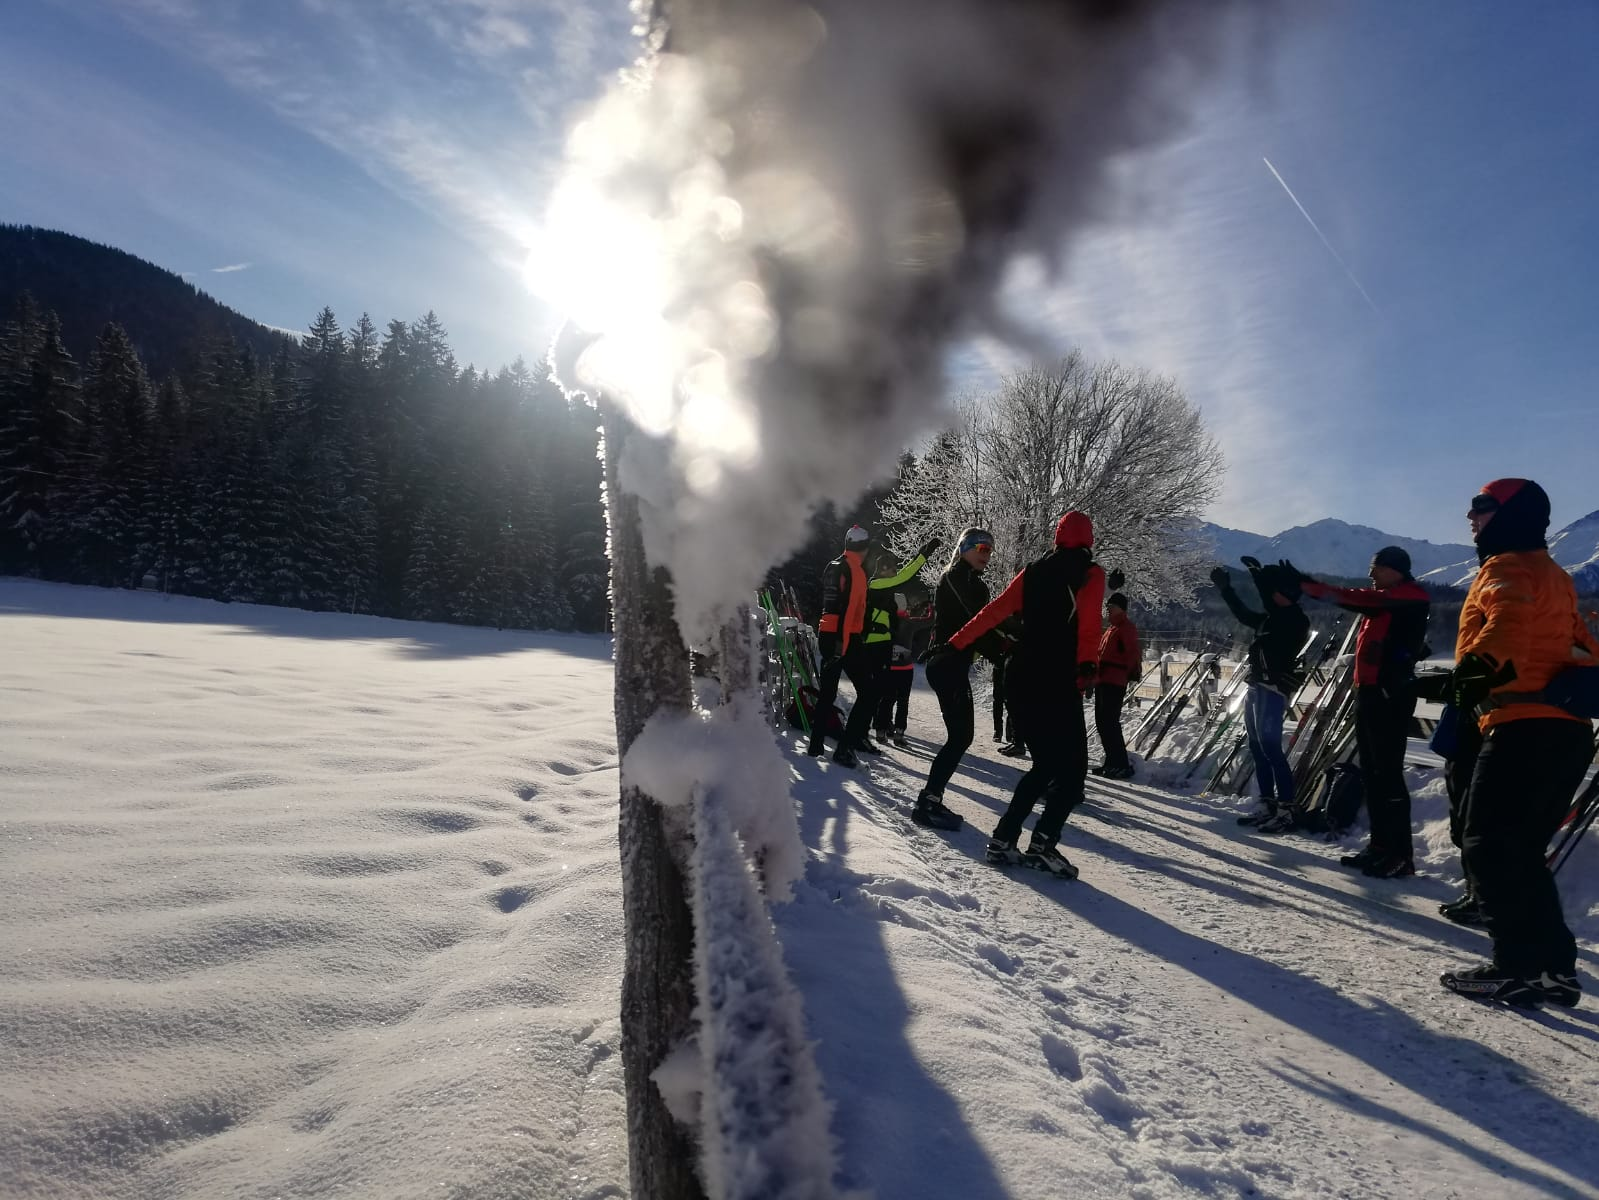 Langlauf Technik Trainingslager Winterwonderland